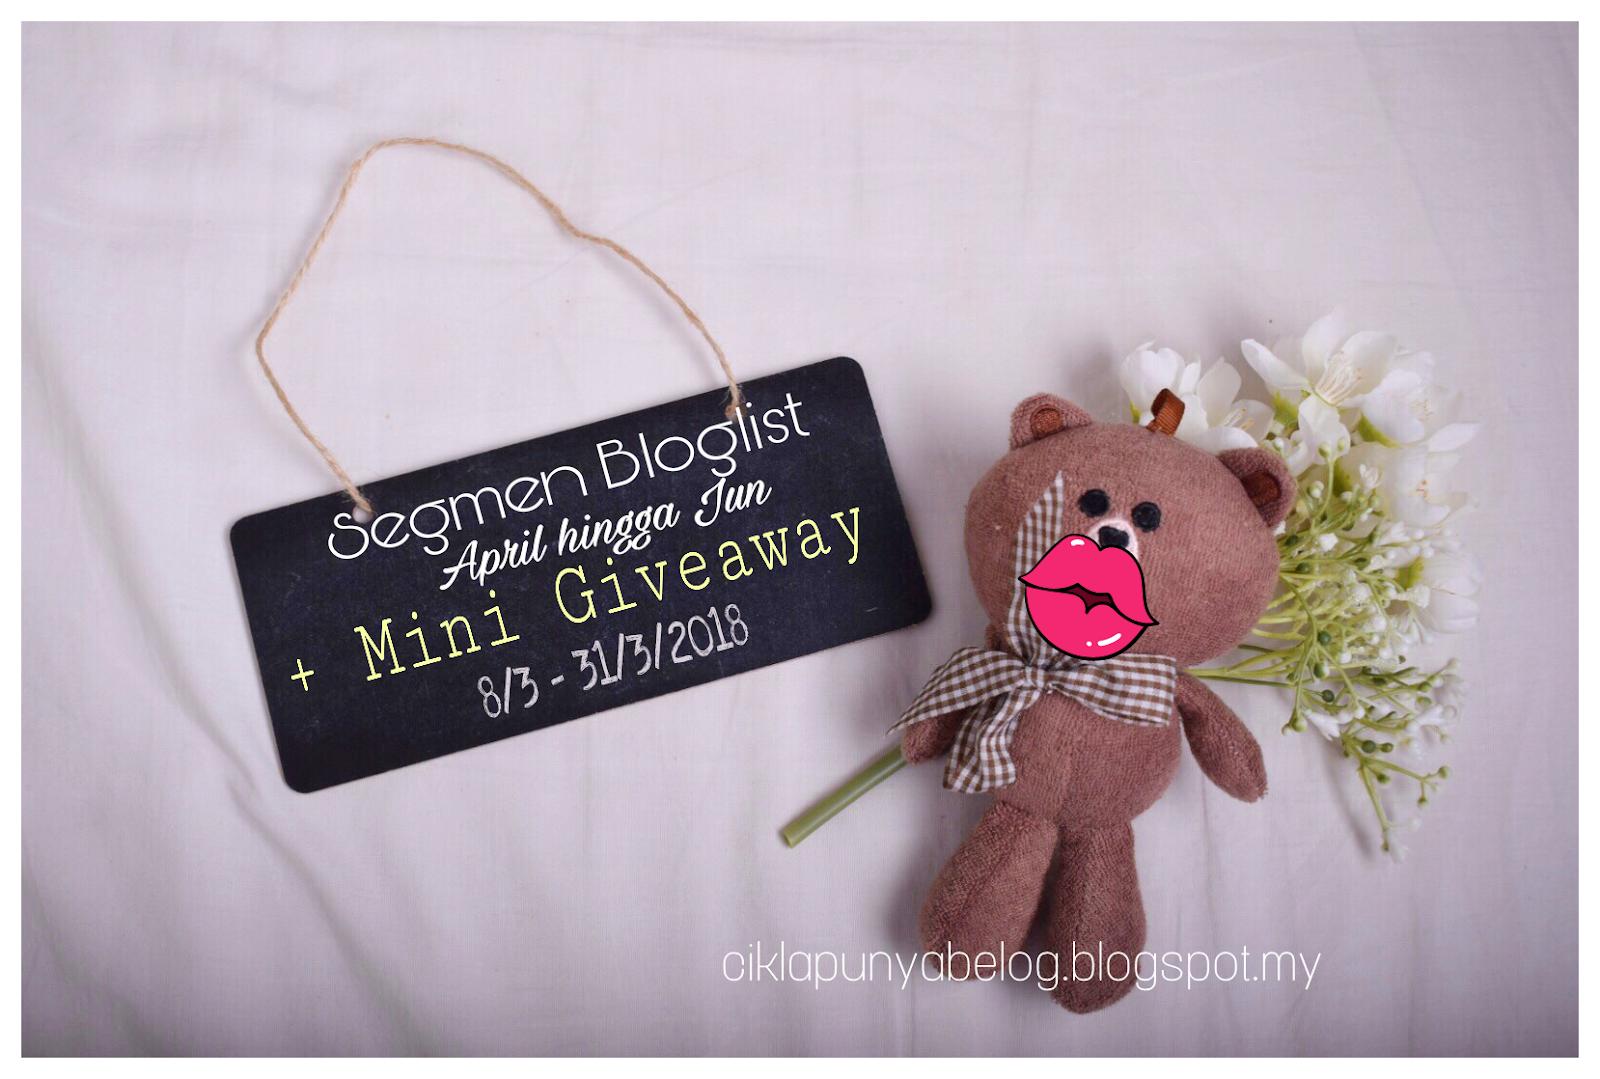 Segmen Bloglist April hingga Jun + Mini Giveaway.